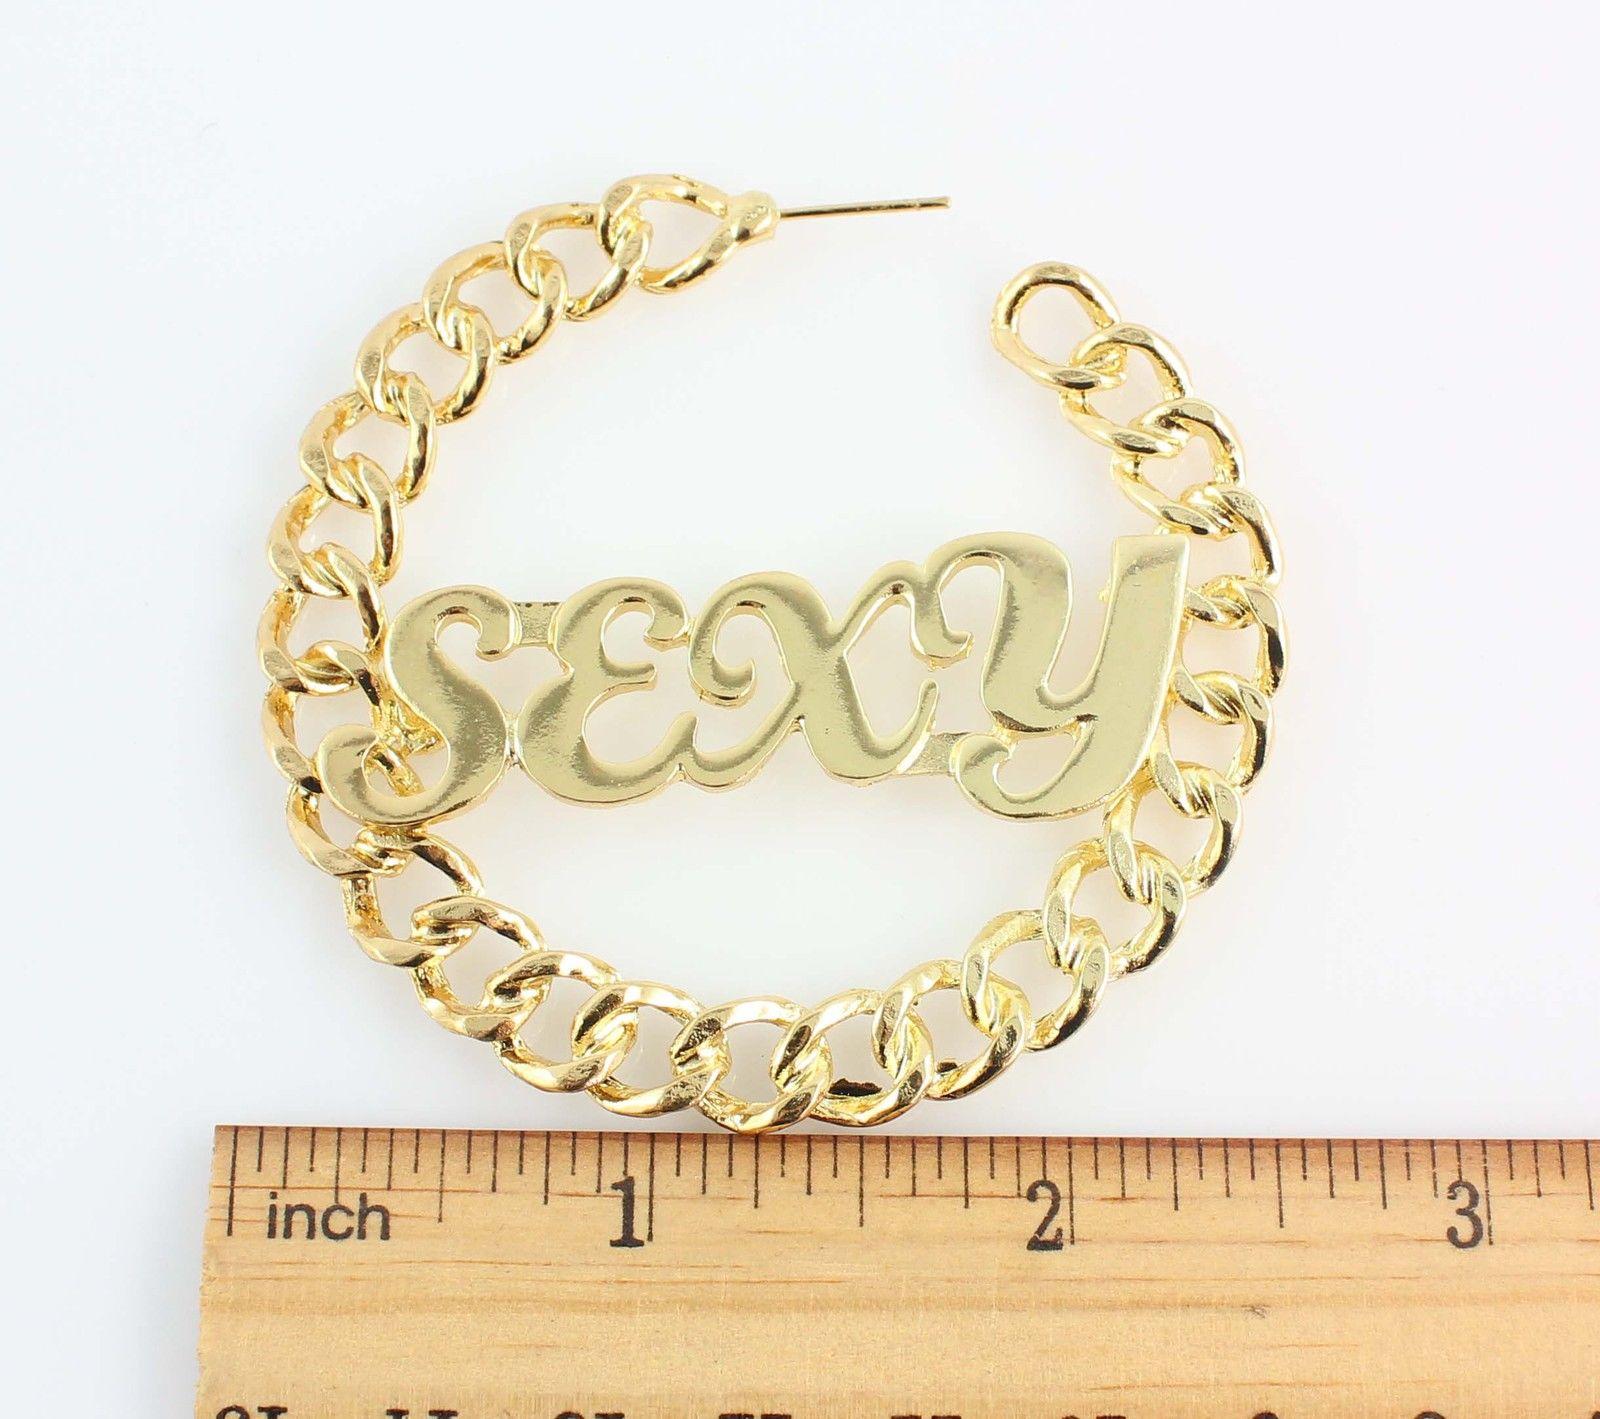 "6 5cm Trendy Gold Tone ""Sexy""Curb Chain Hoop Earrings Hip Hop Jewelry   eBay"